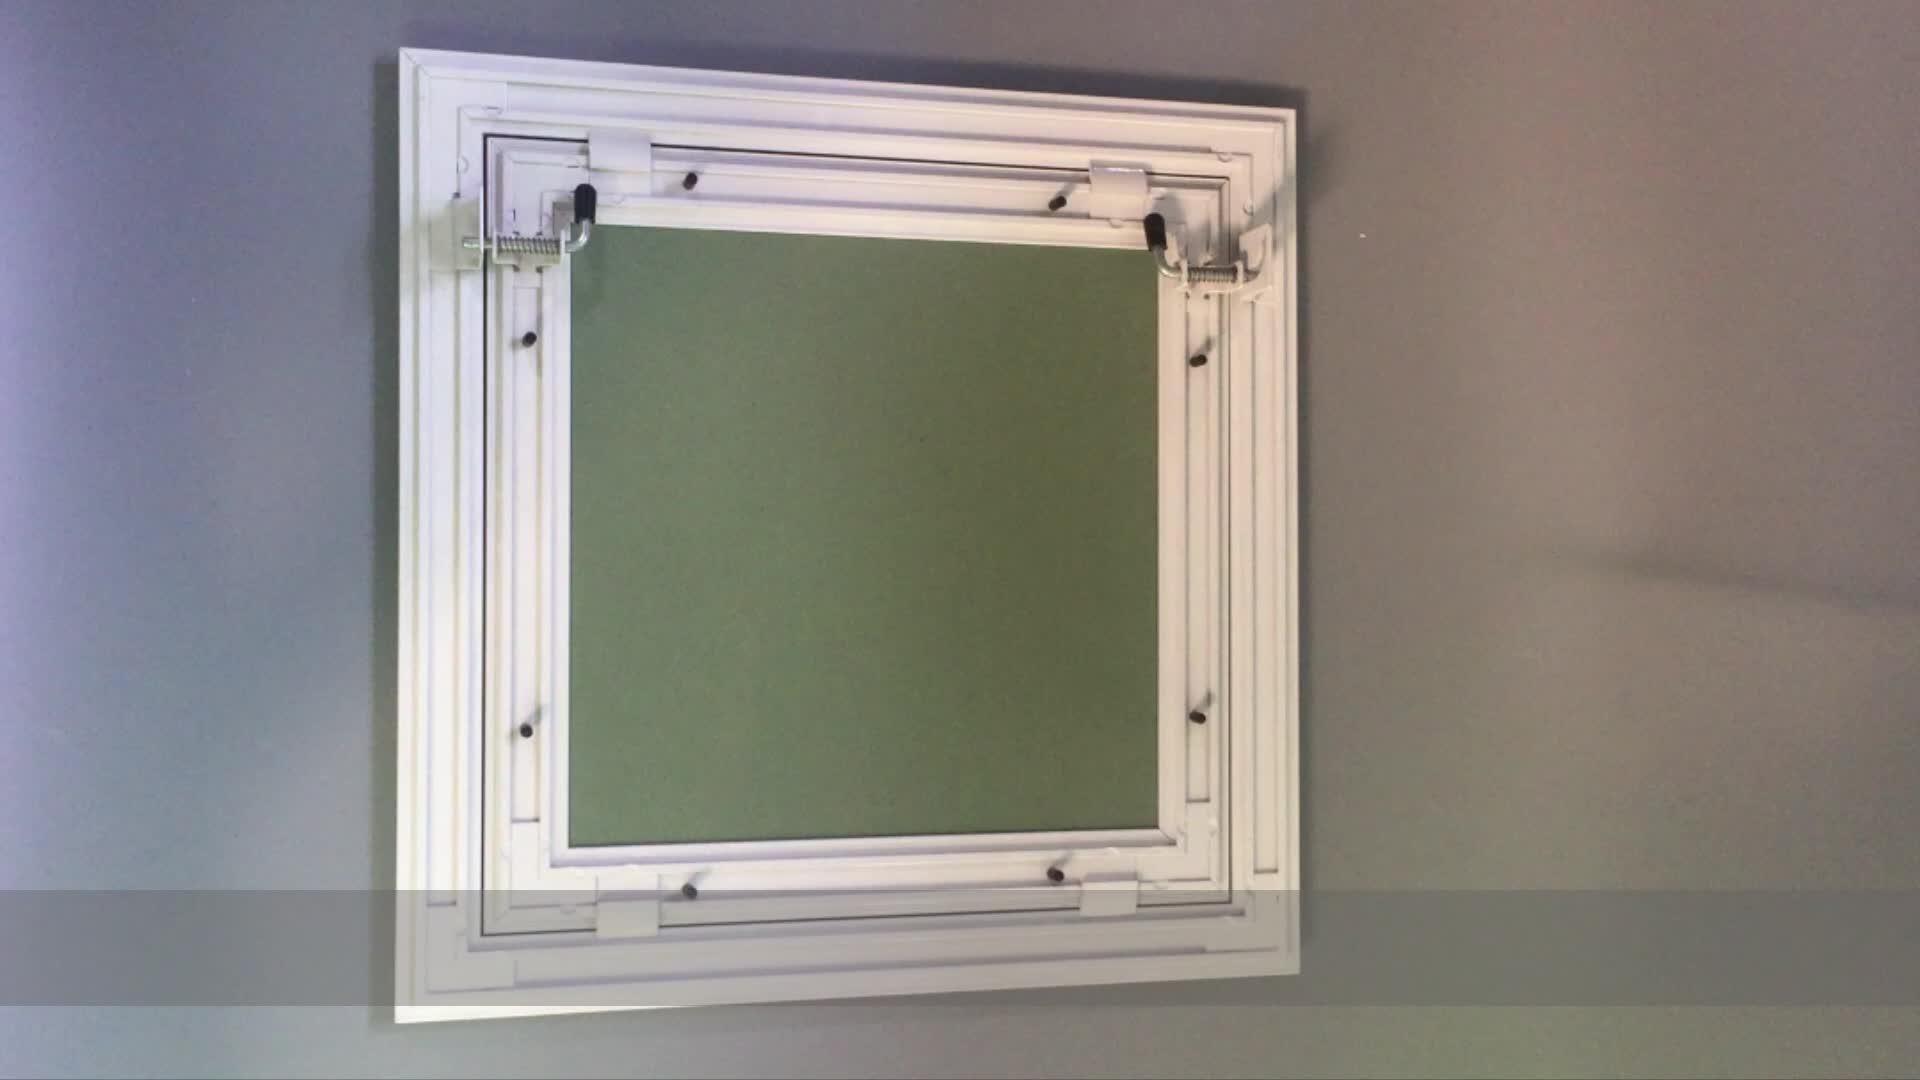 Aluminum Access Doors : Gypsum board plaster aluminum access door panel for